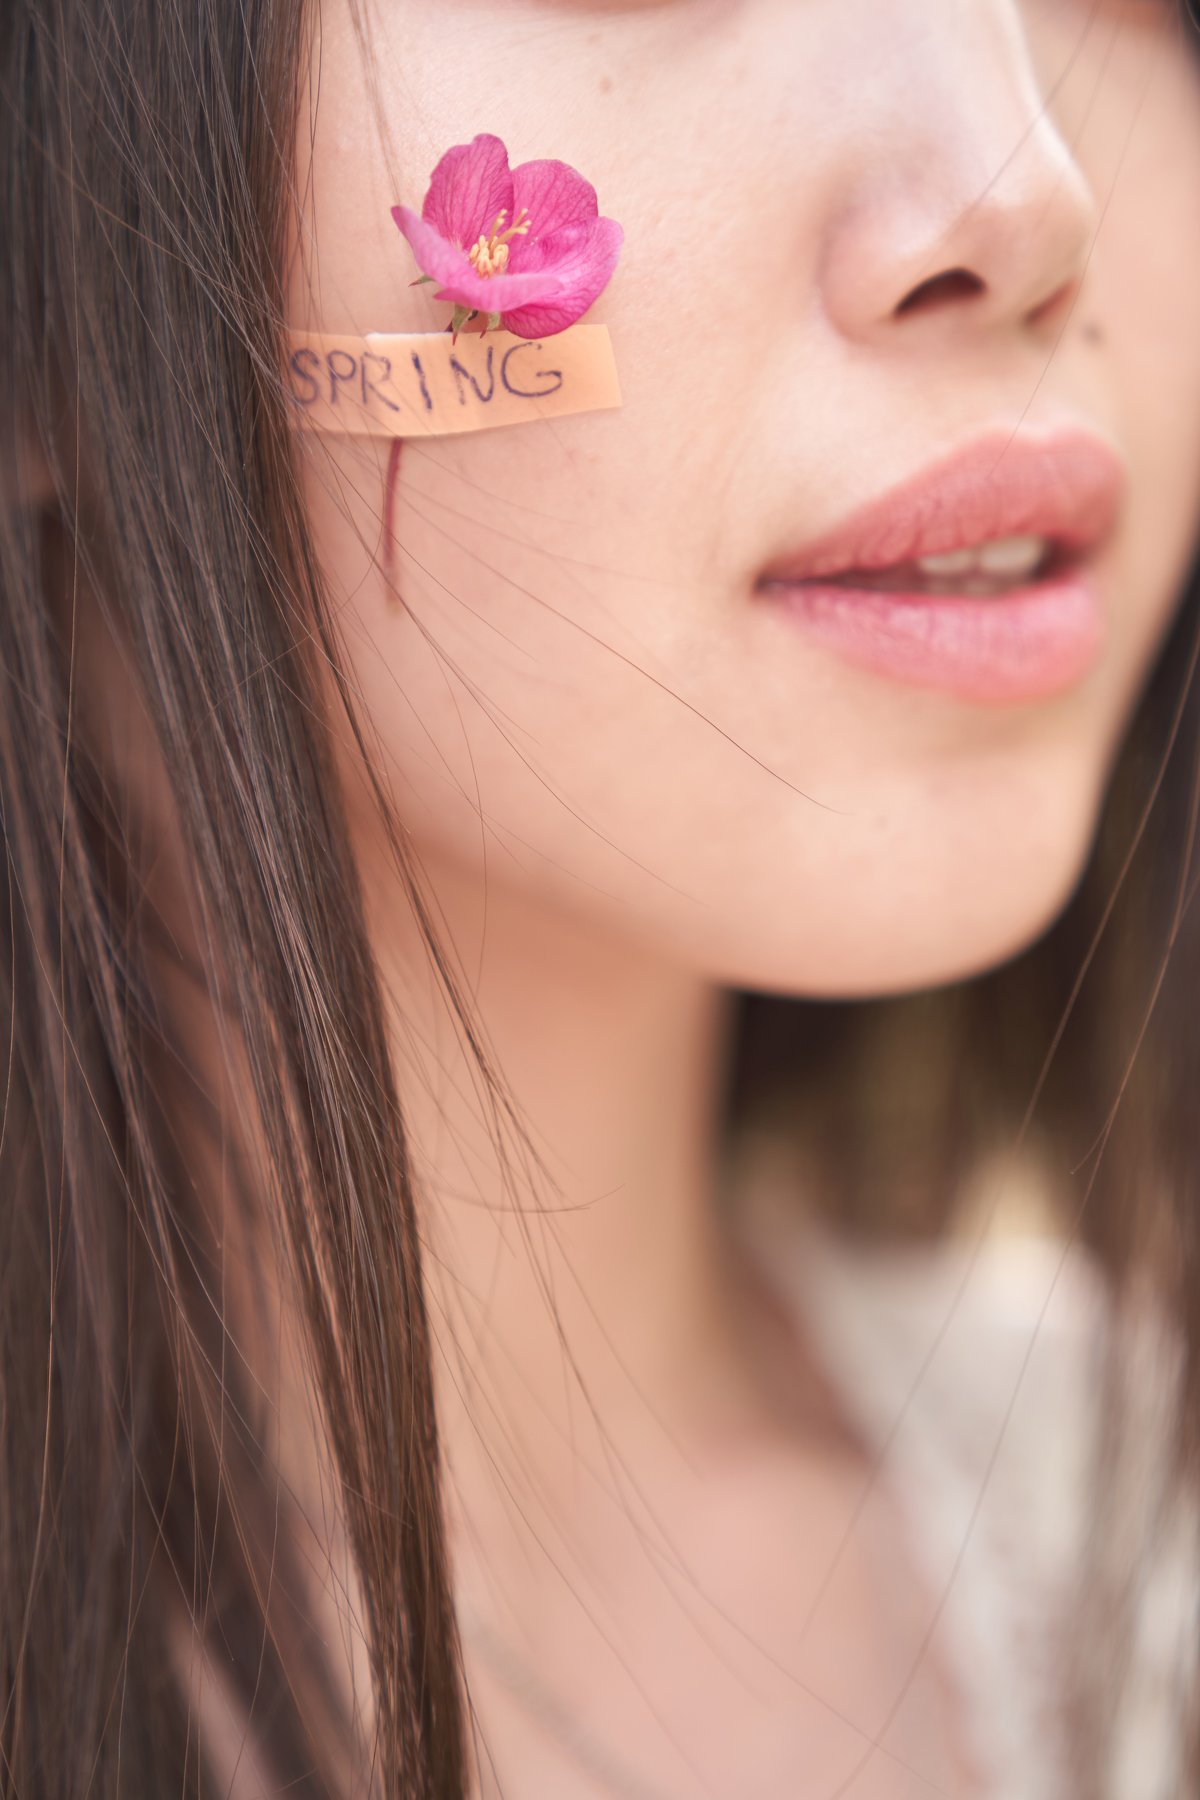 яблоня, весна, цветок, лейкопластырь, губы, розовый, Комарова Дарья